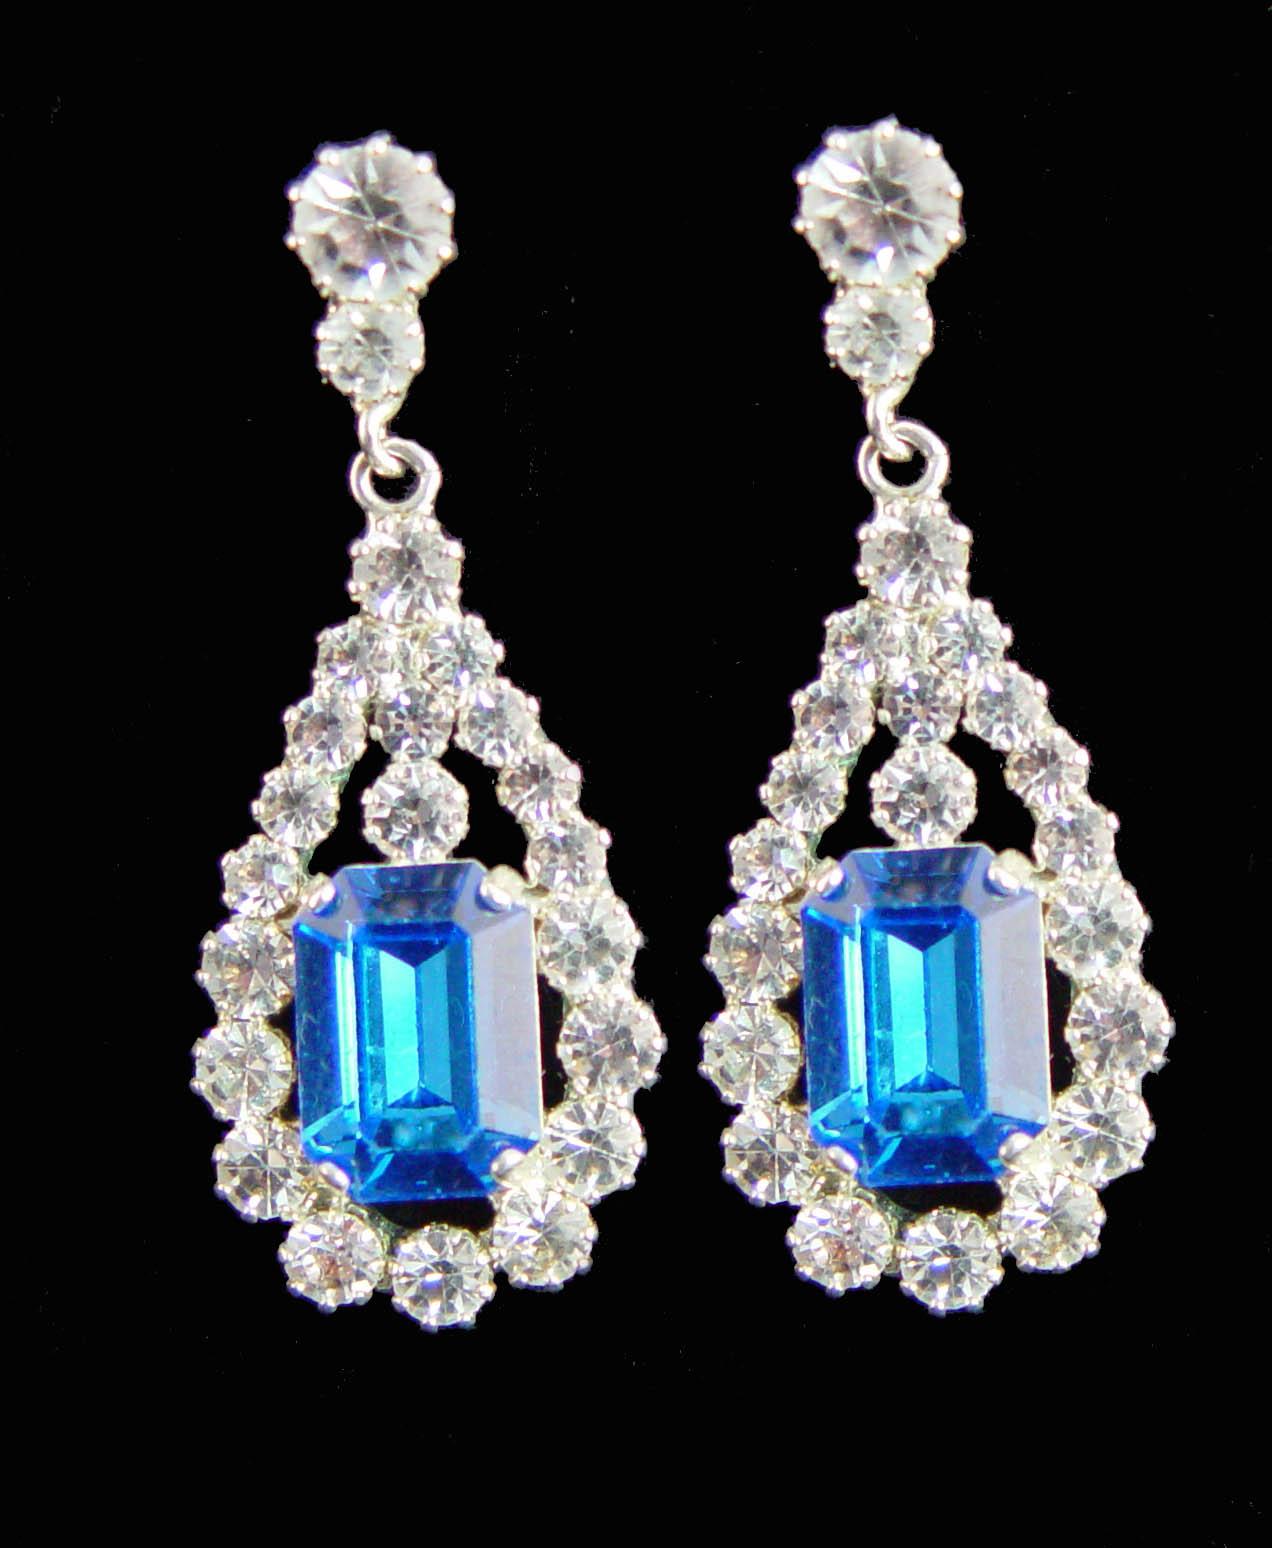 Queen S Earrings Royal Exhibitions